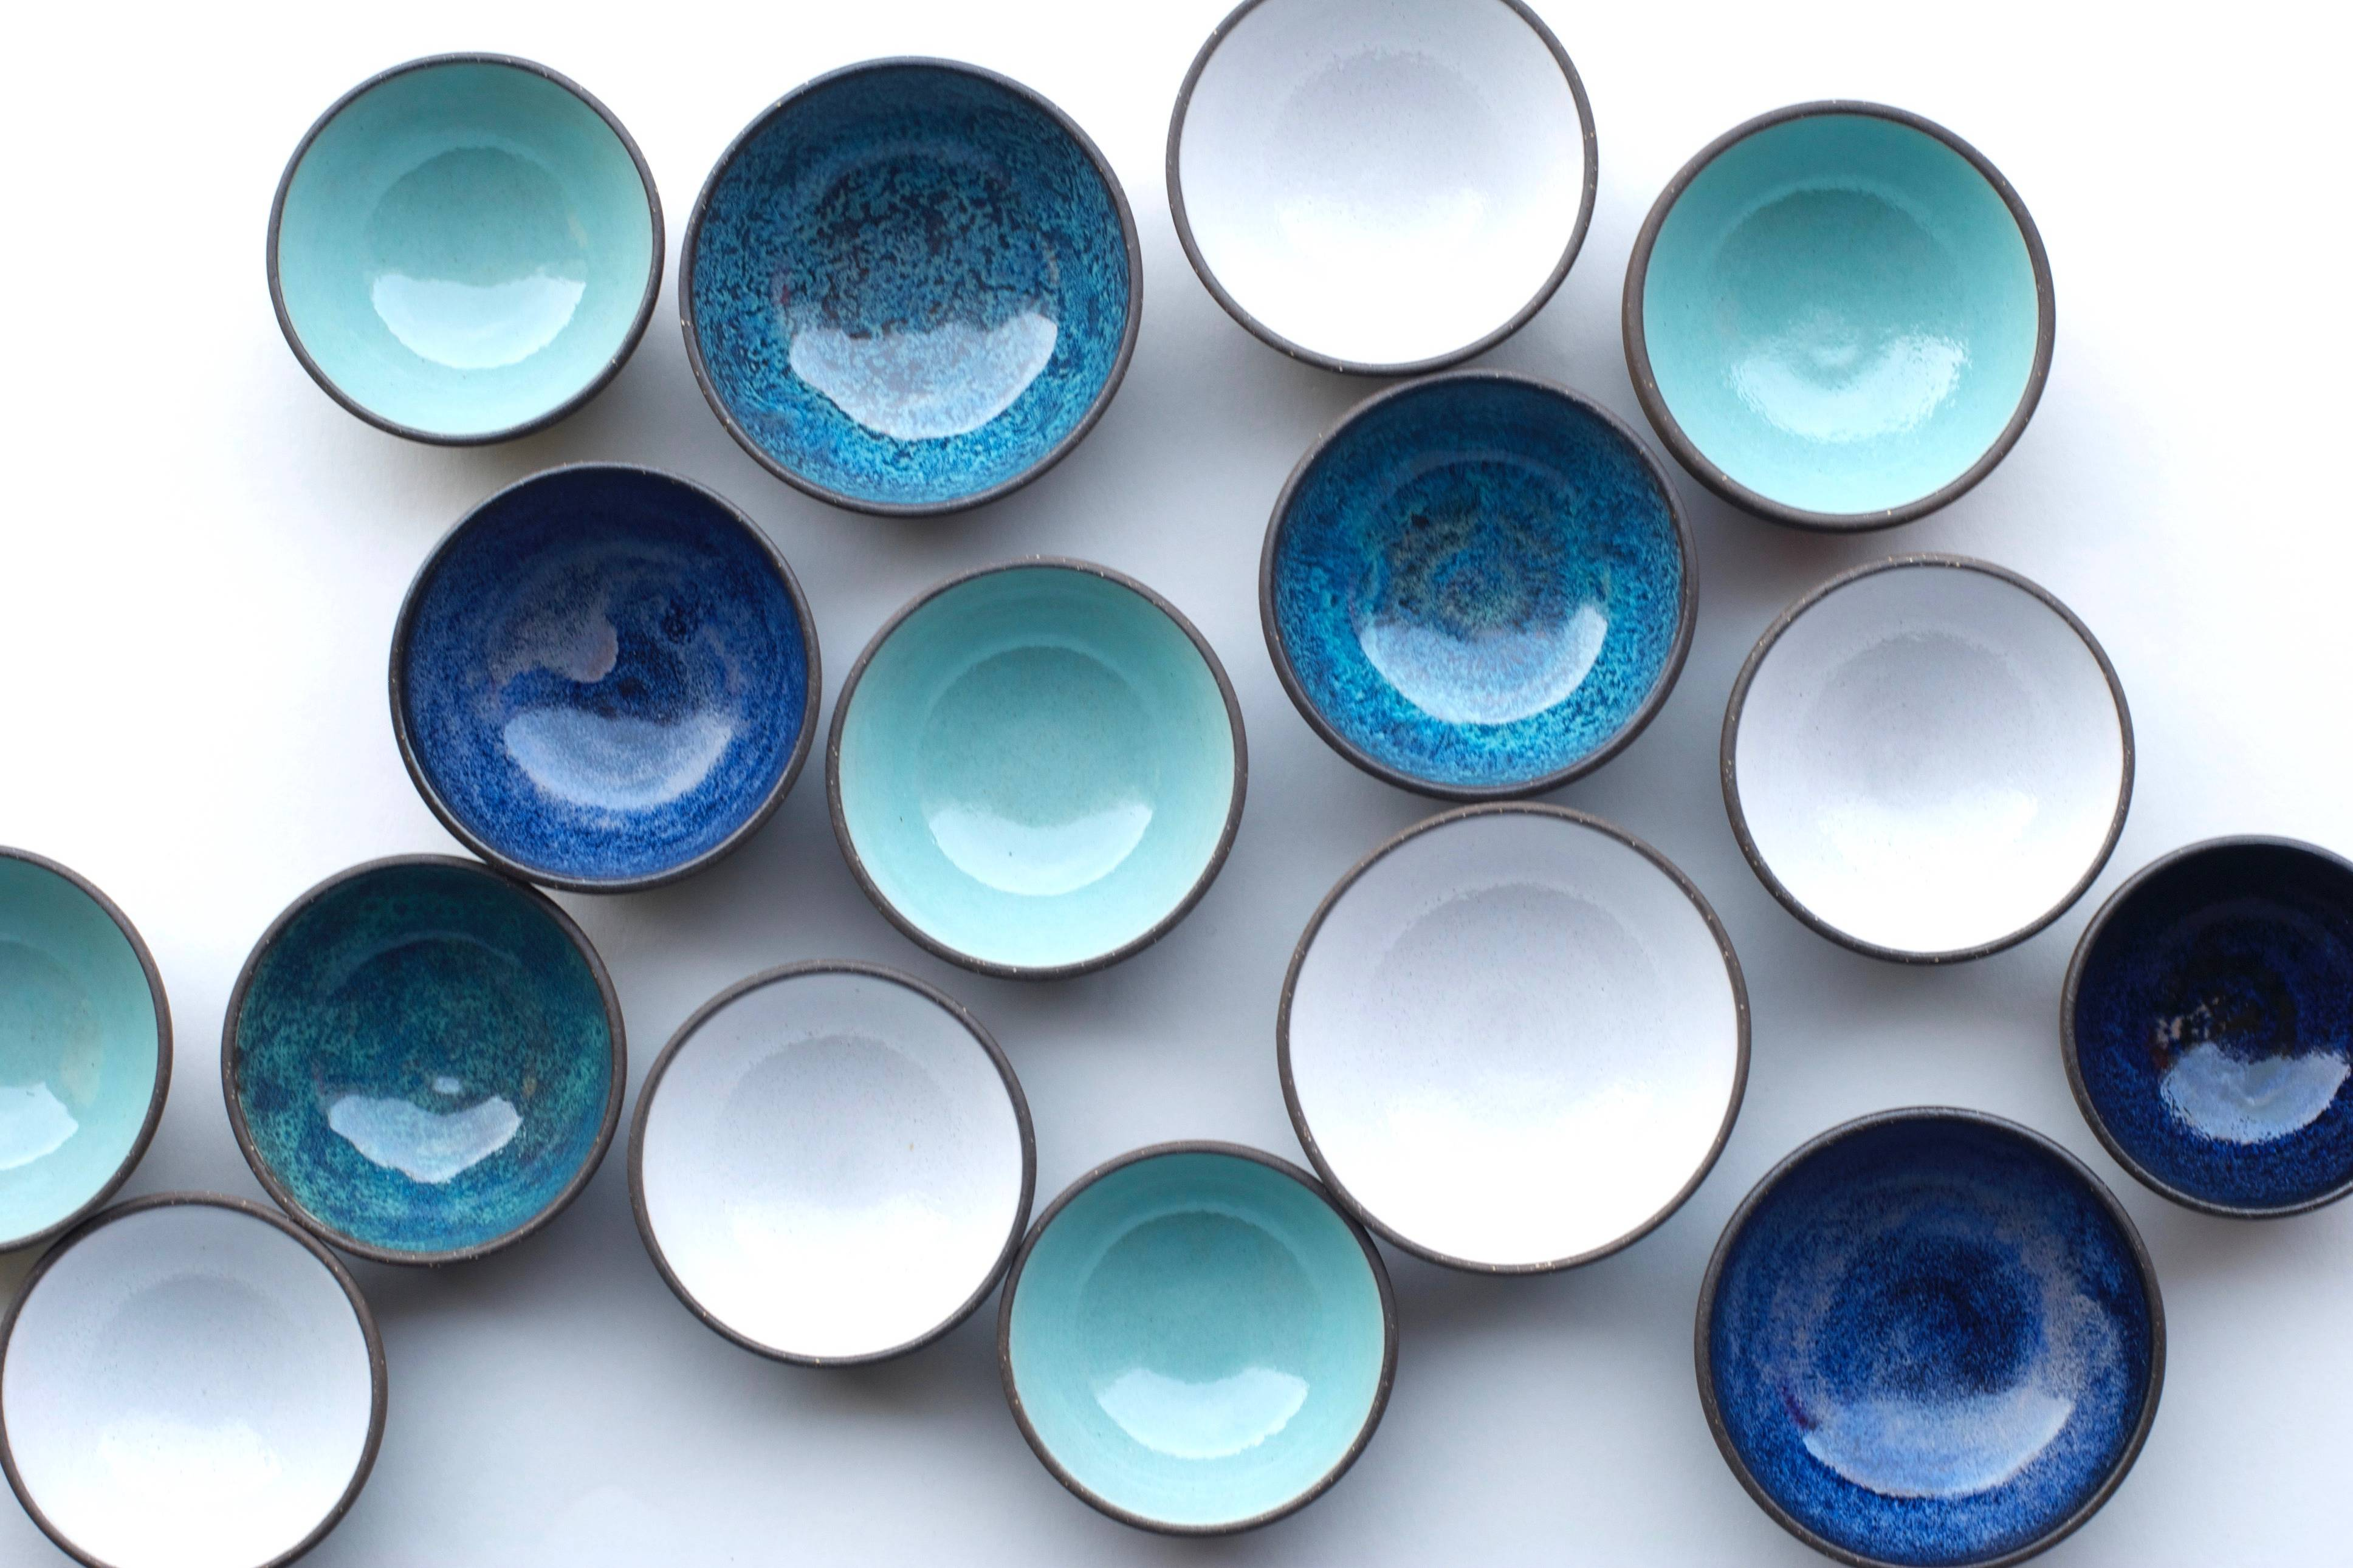 Bebe Federmann, Keramik, Ton, Geschirr, Schalen, Ceramics, Handmade